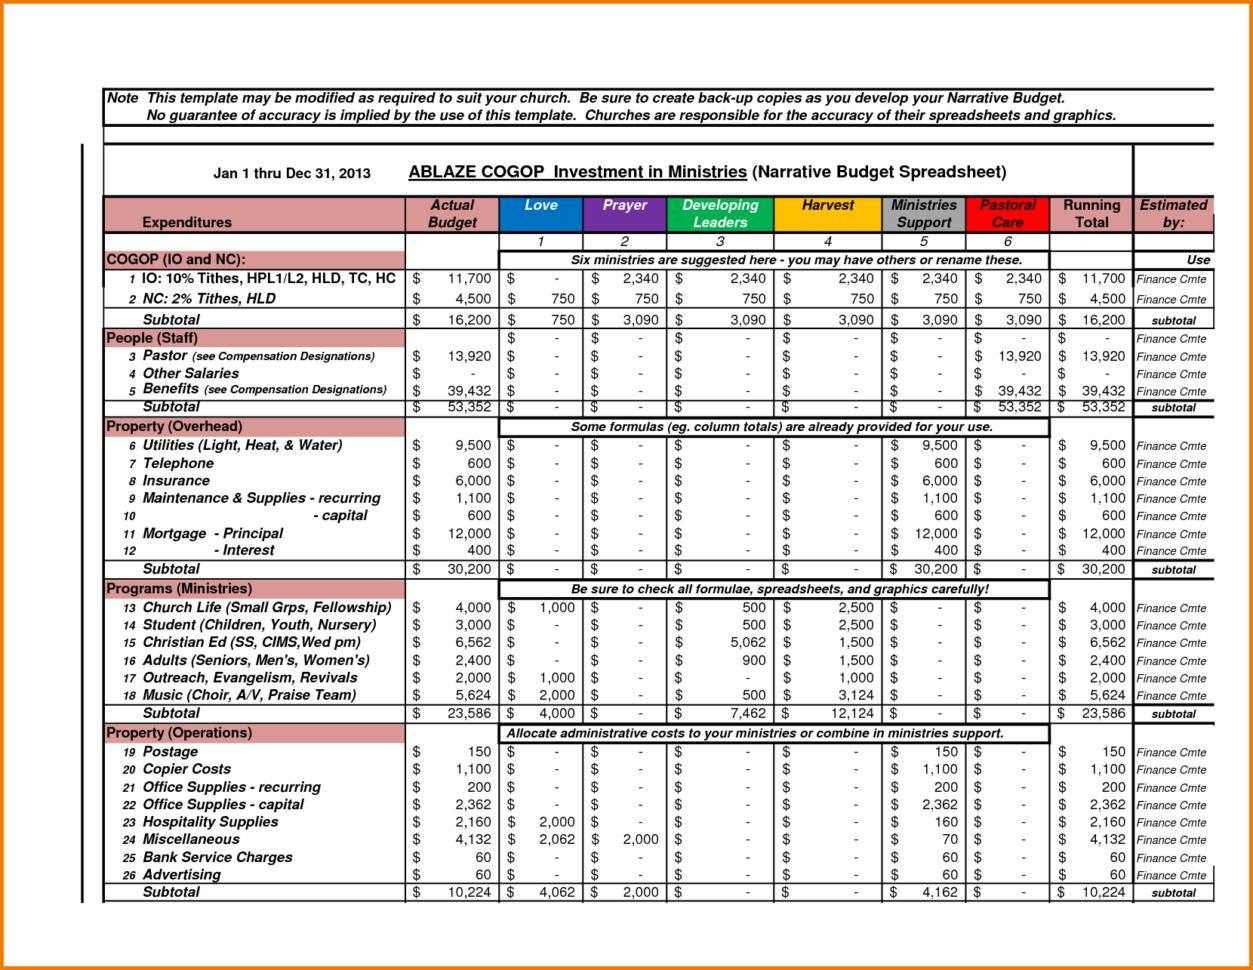 Sample Sales Forecast Spreadsheet Inside Sales Forecast Spreadsheet Template And Sample Of Bud Spreadsheet